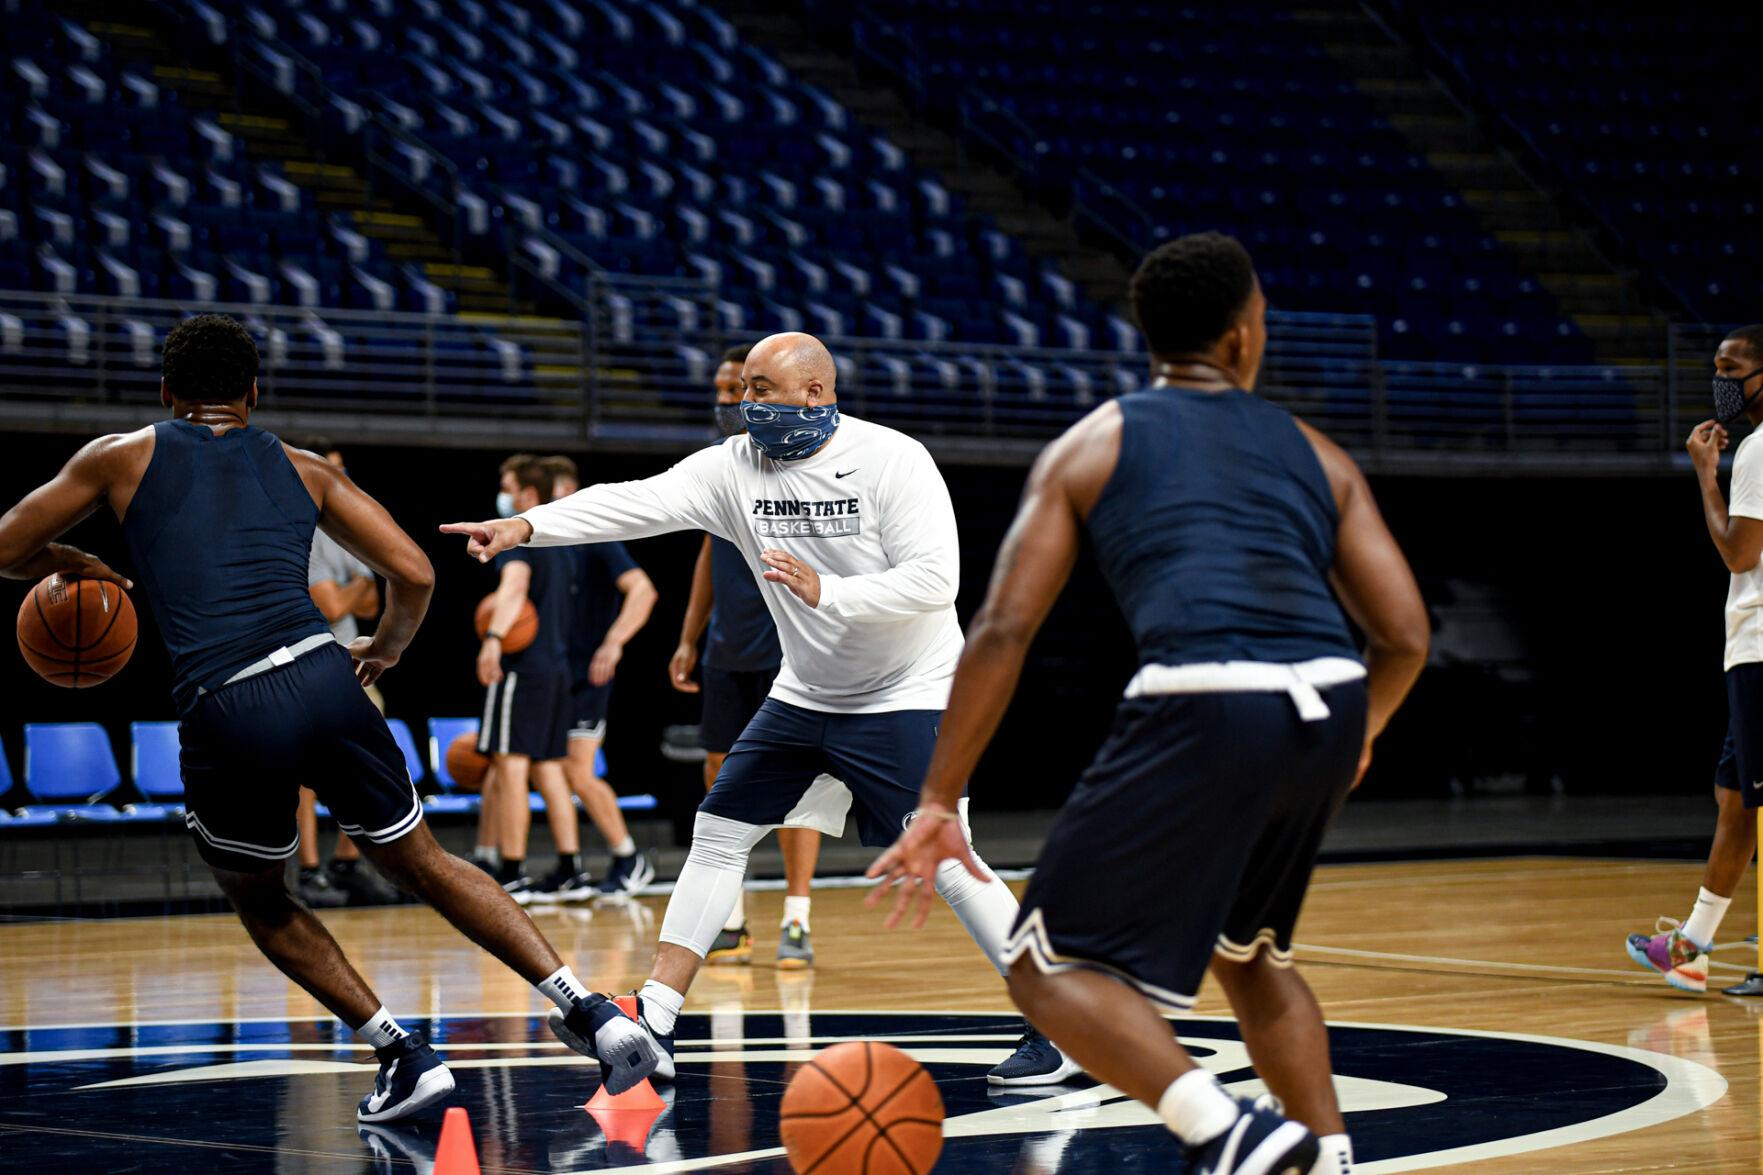 psu.edu - Alexis Yoder | The Daily Collegian - Penn State men's basketball, Micah Shrewsberry focus on 'win now' mentality ahead of 2021 season